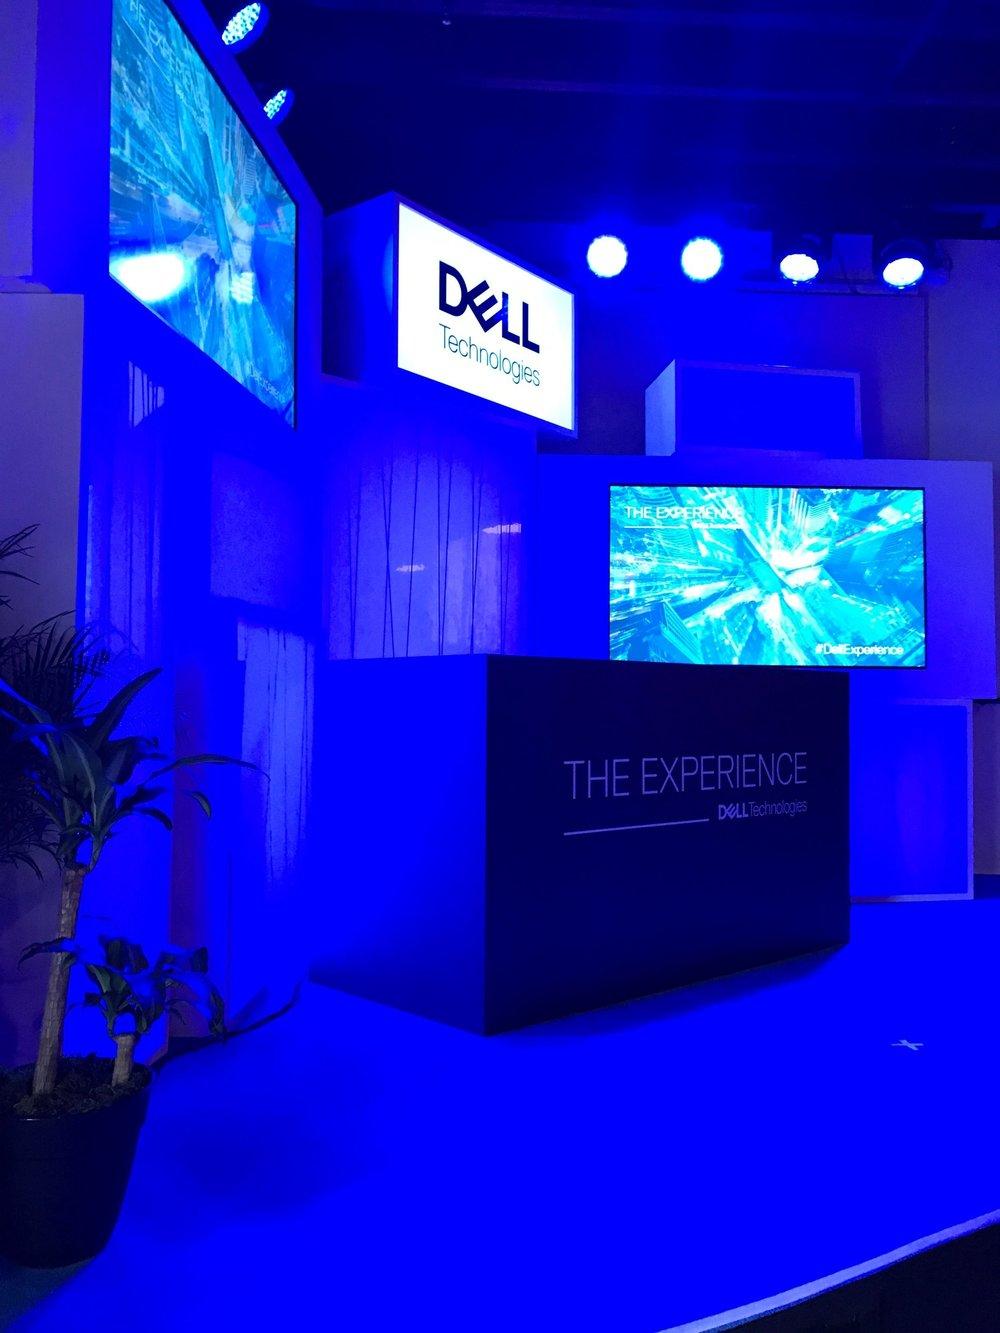 The Delk Experience.jpg